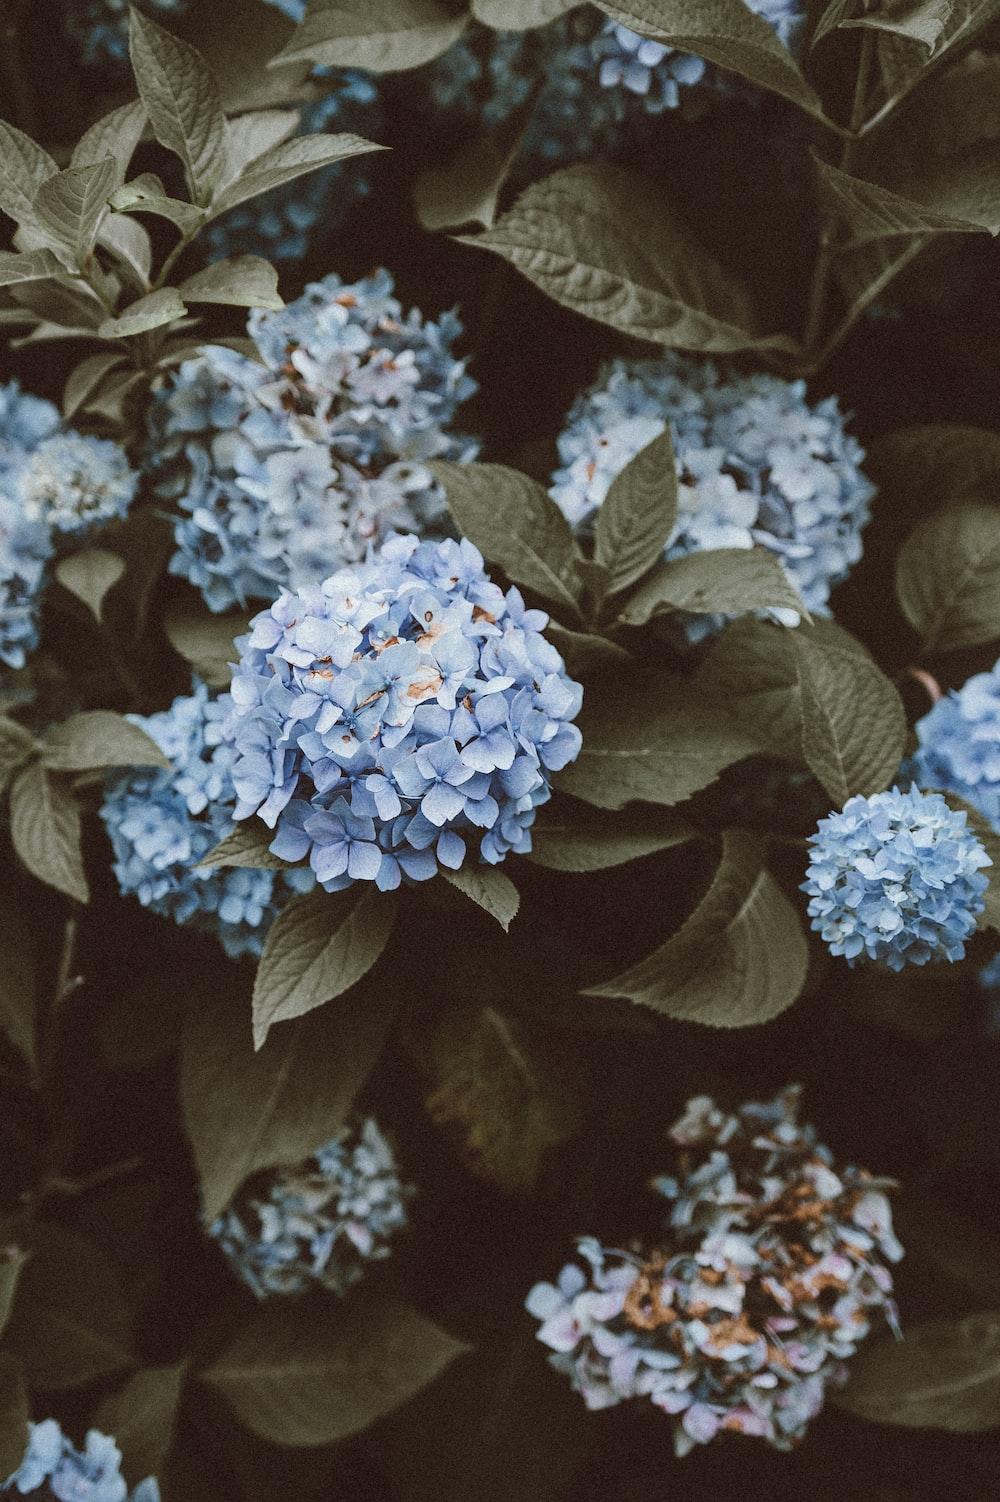 500 Blue Flower Pictures Hd Download Free Images On Unsplash